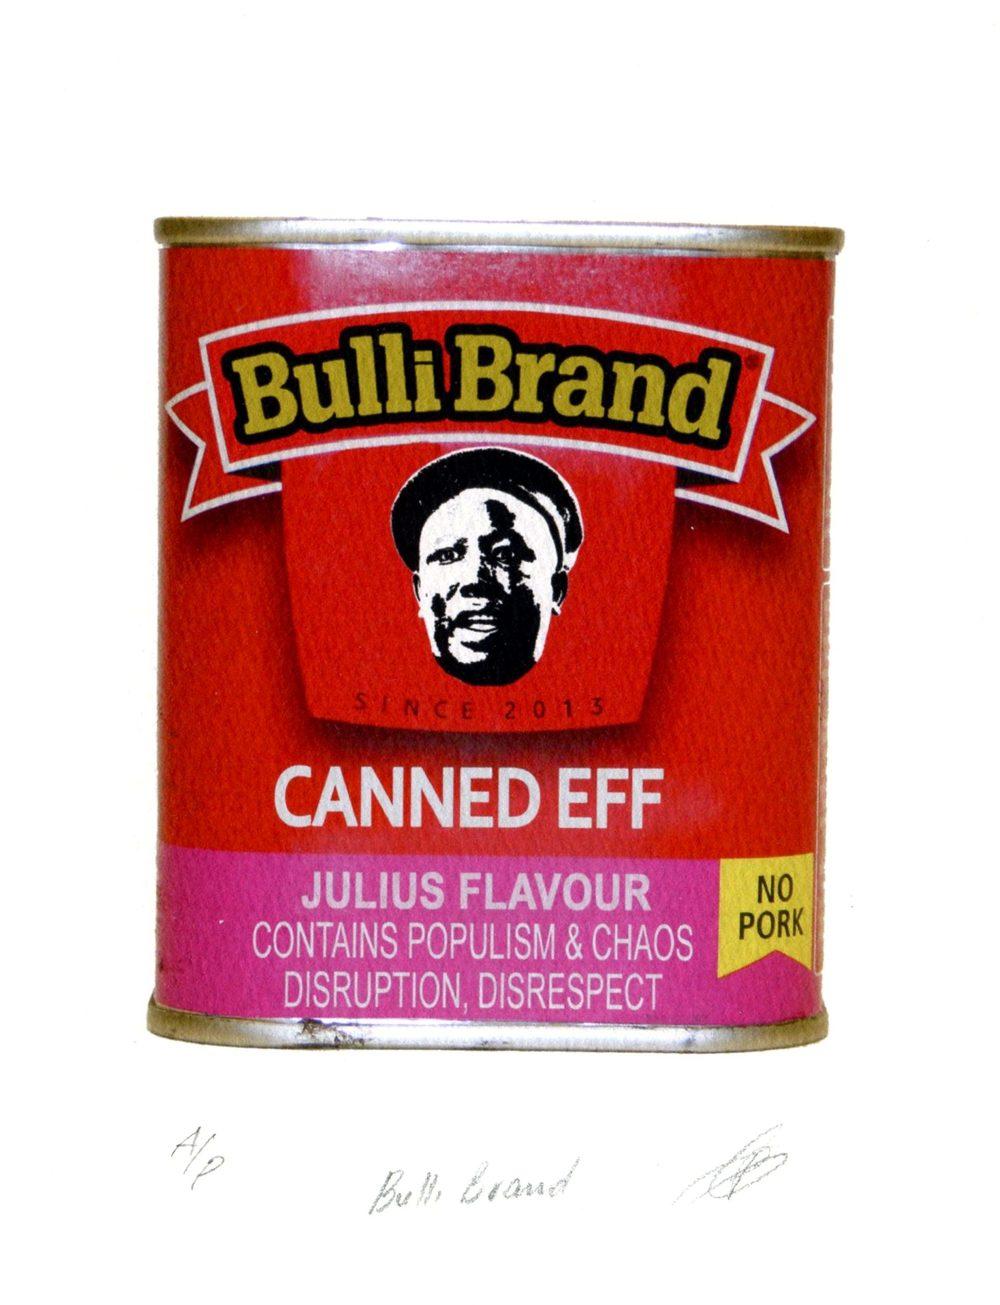 Ntshangase, Phumlani  48, Bull Brand, Digital print (AP).